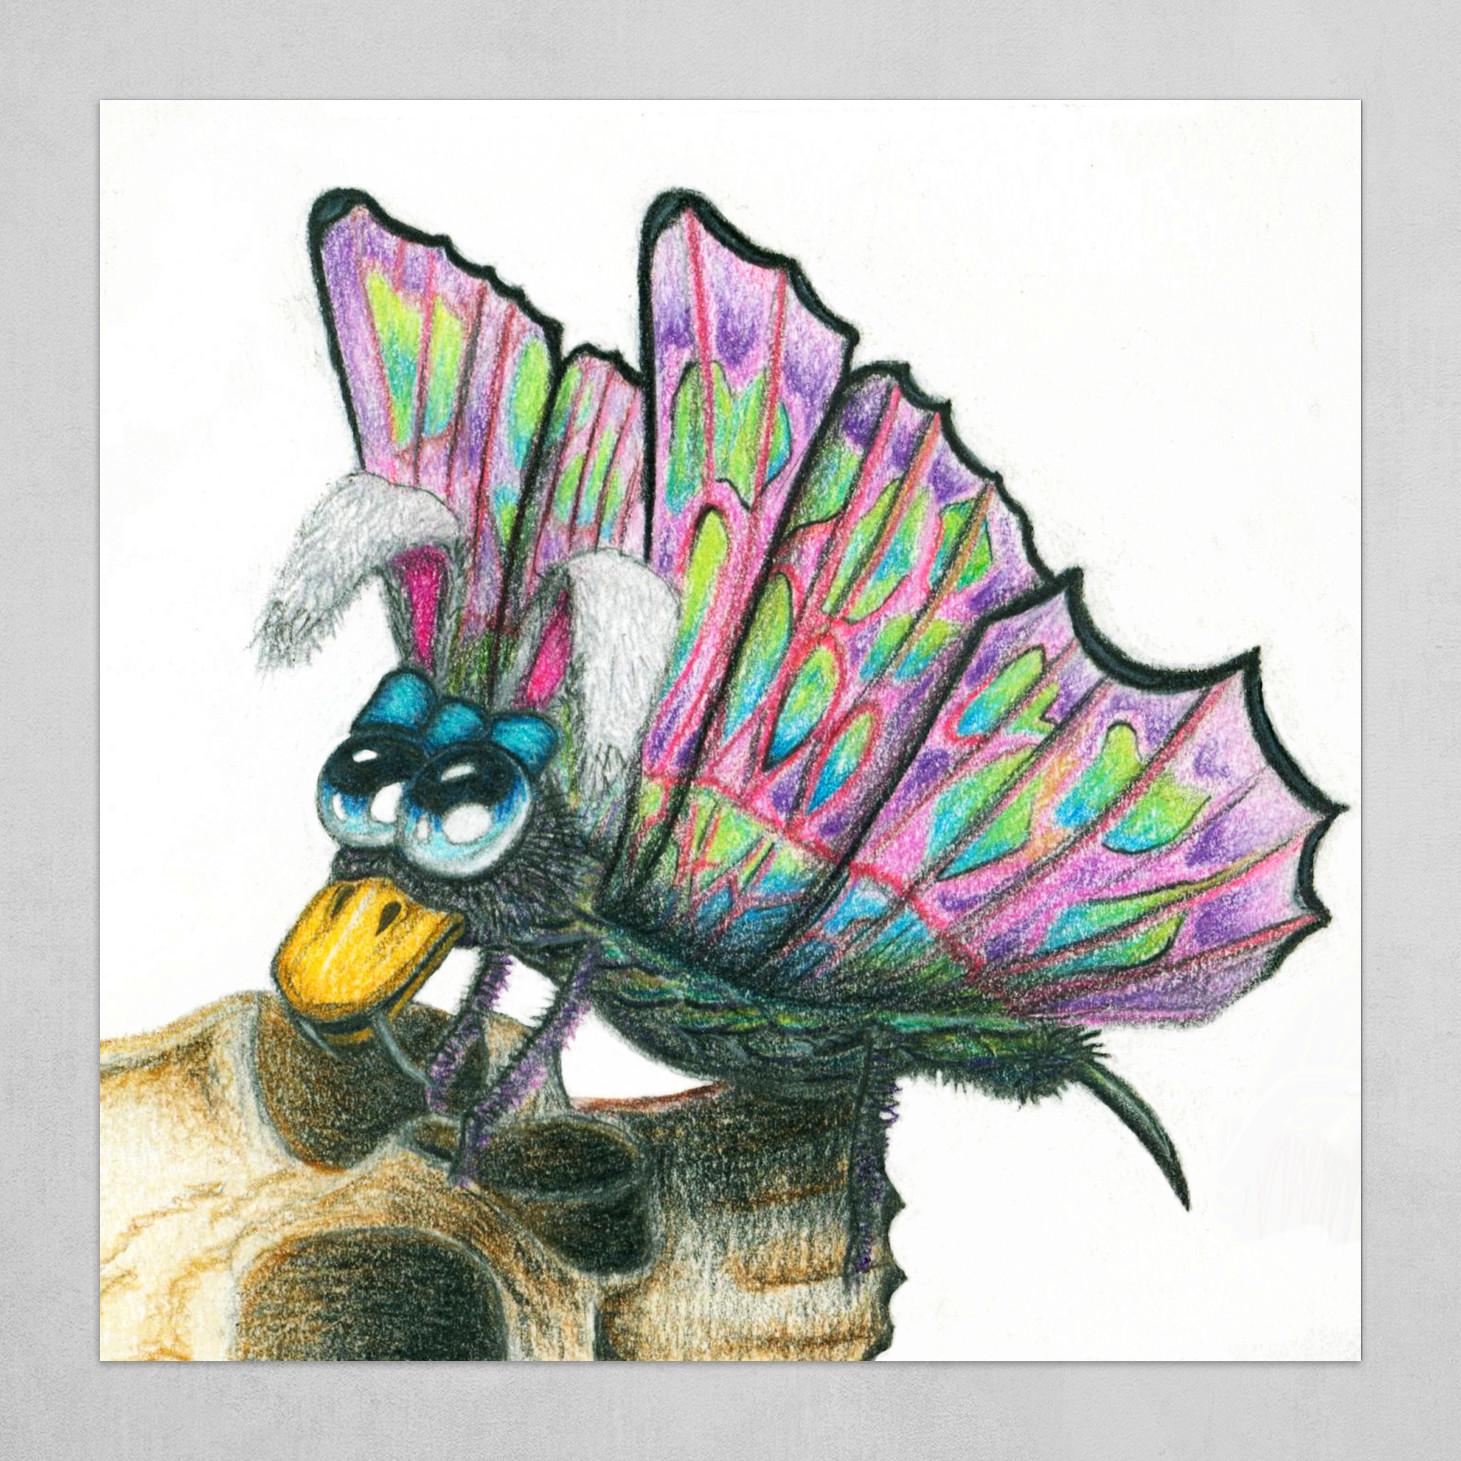 BeFucterfly